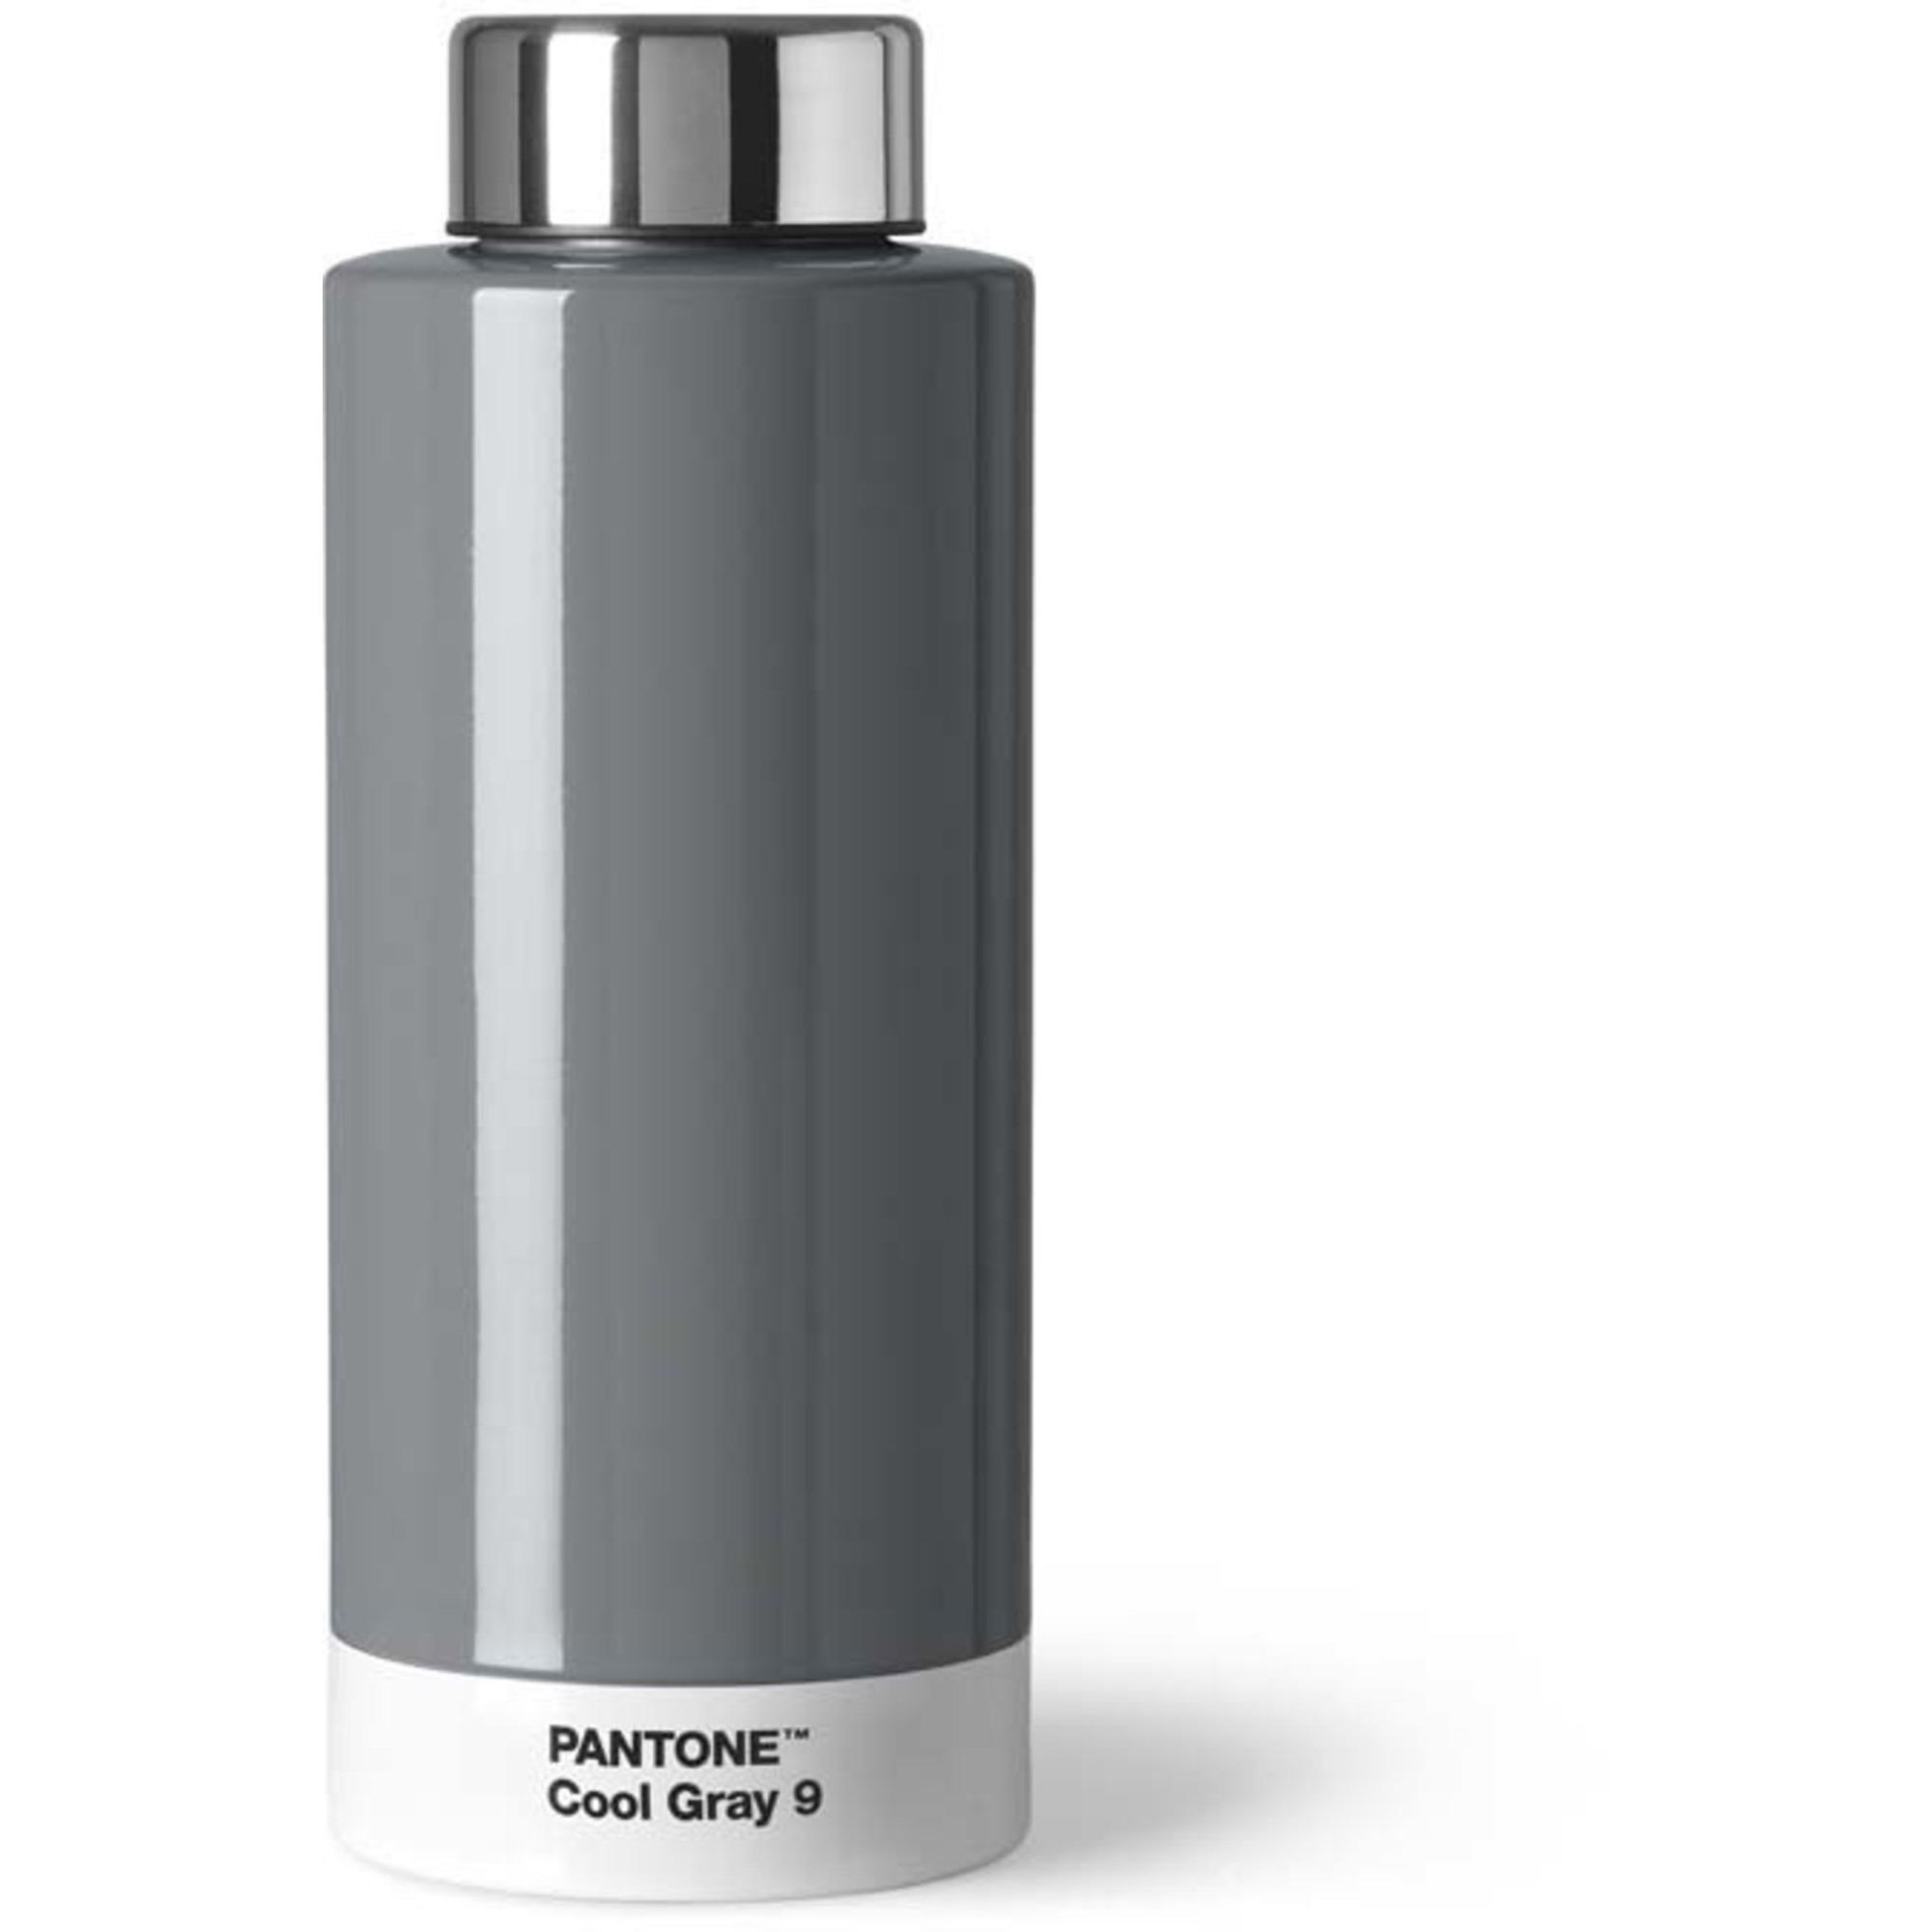 Pantone Living Vattenflaska 63 cl Grå